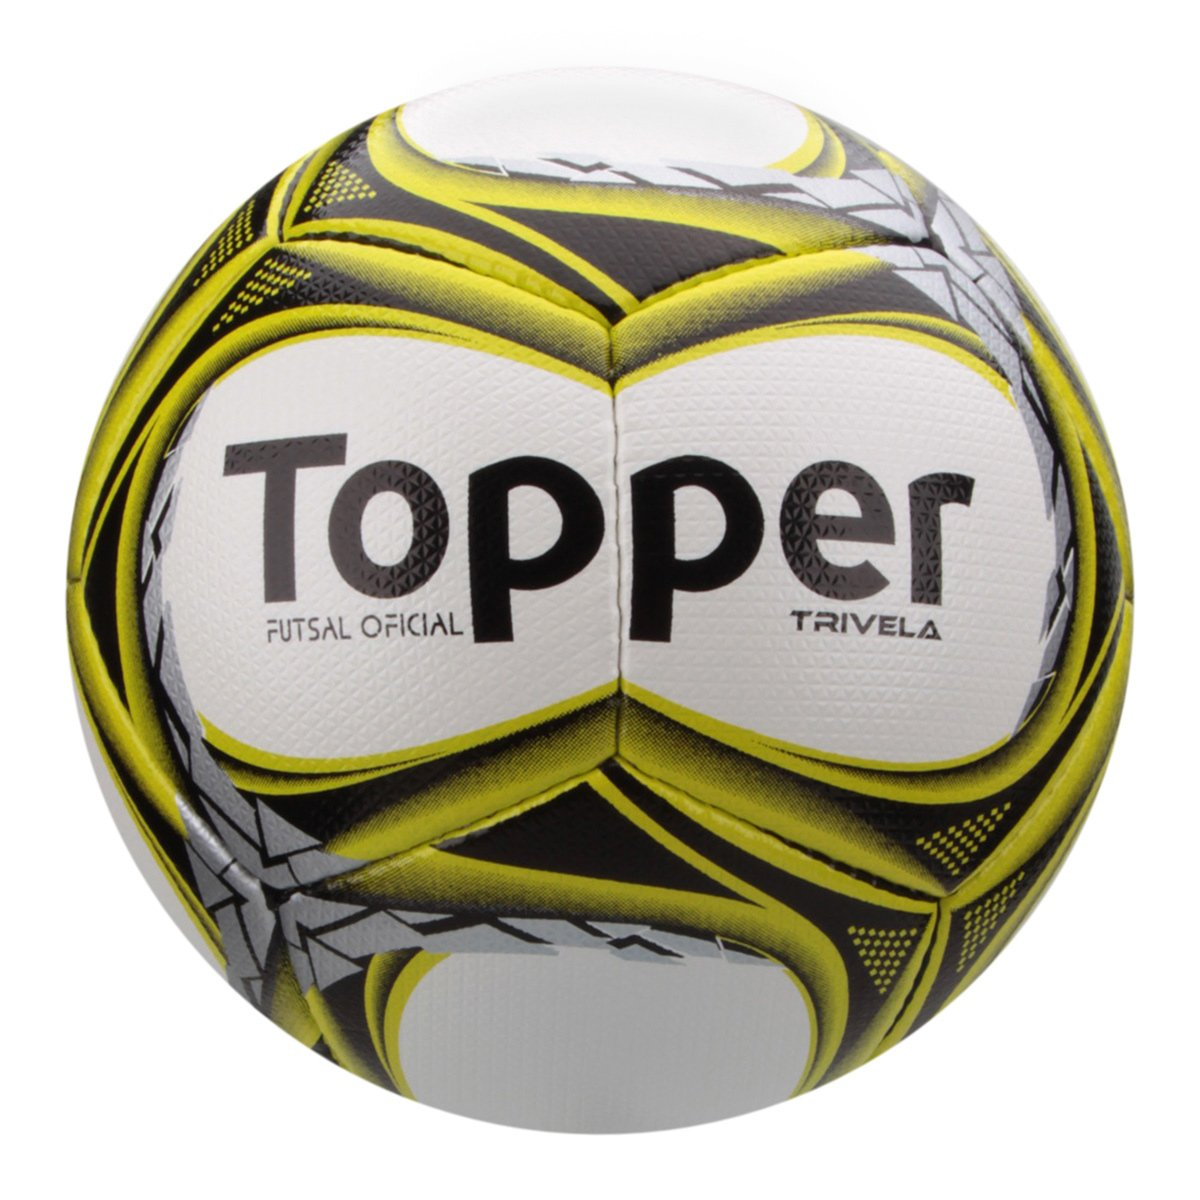 Bola Futsal Topper Trivela V12 - Branco e Amarelo - Compre Agora ... 84de5e38a8a73